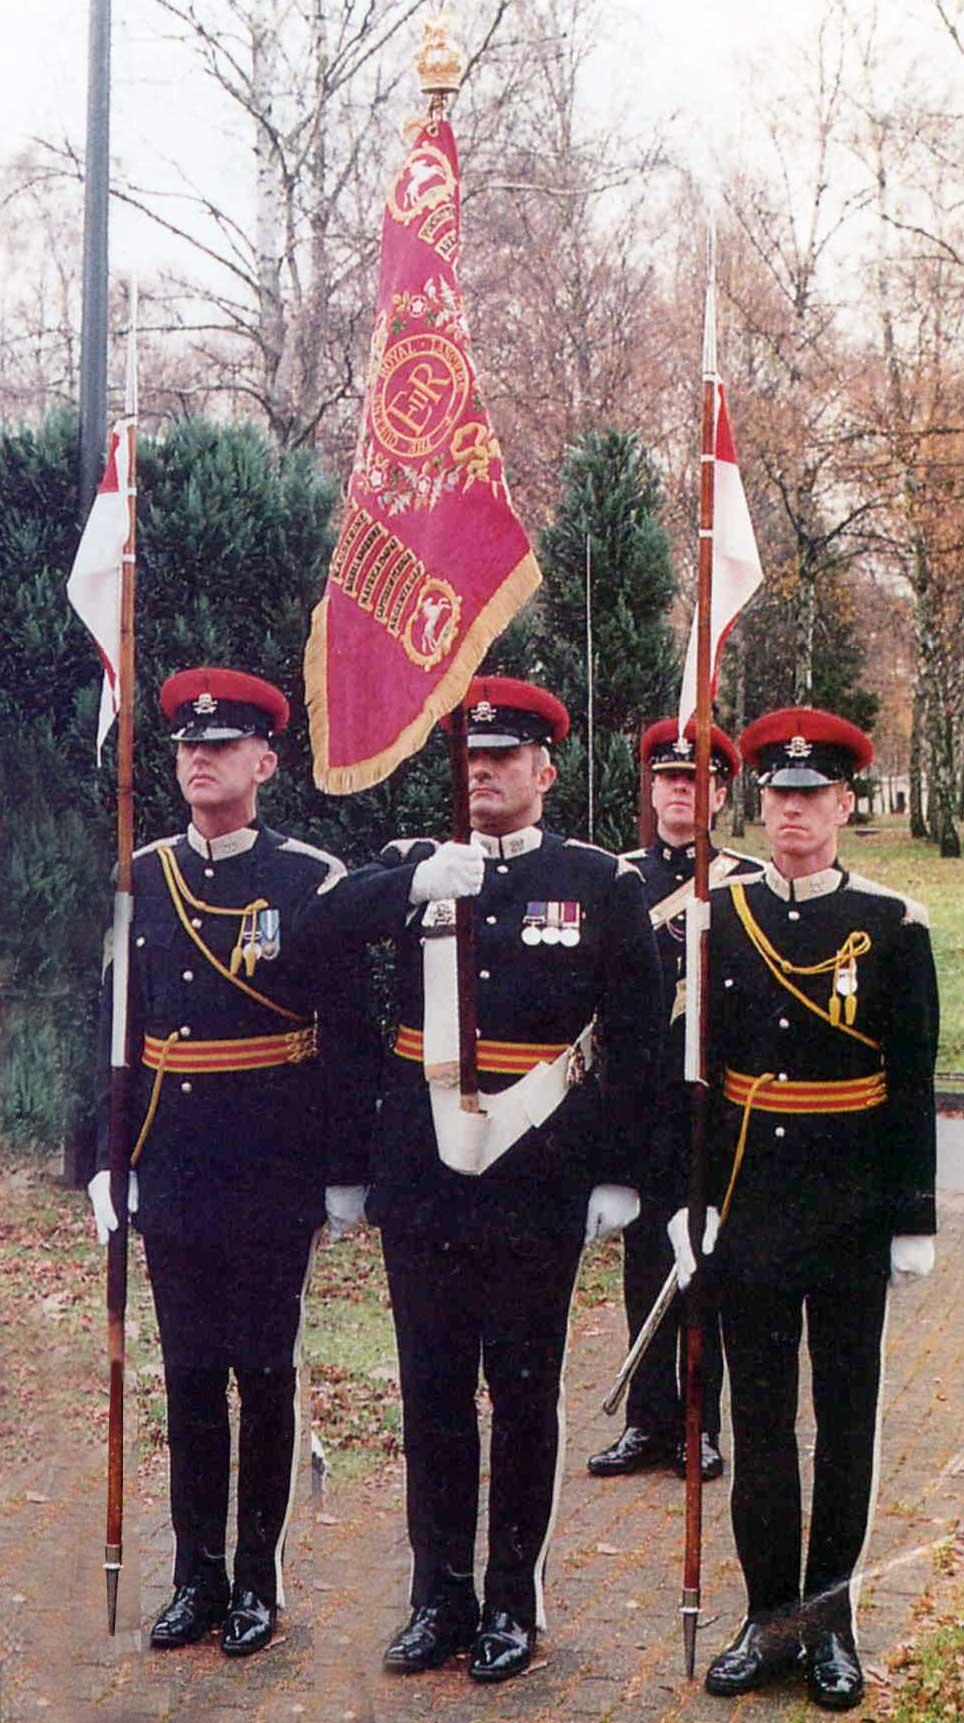 униформа Queen's Royal Lancers